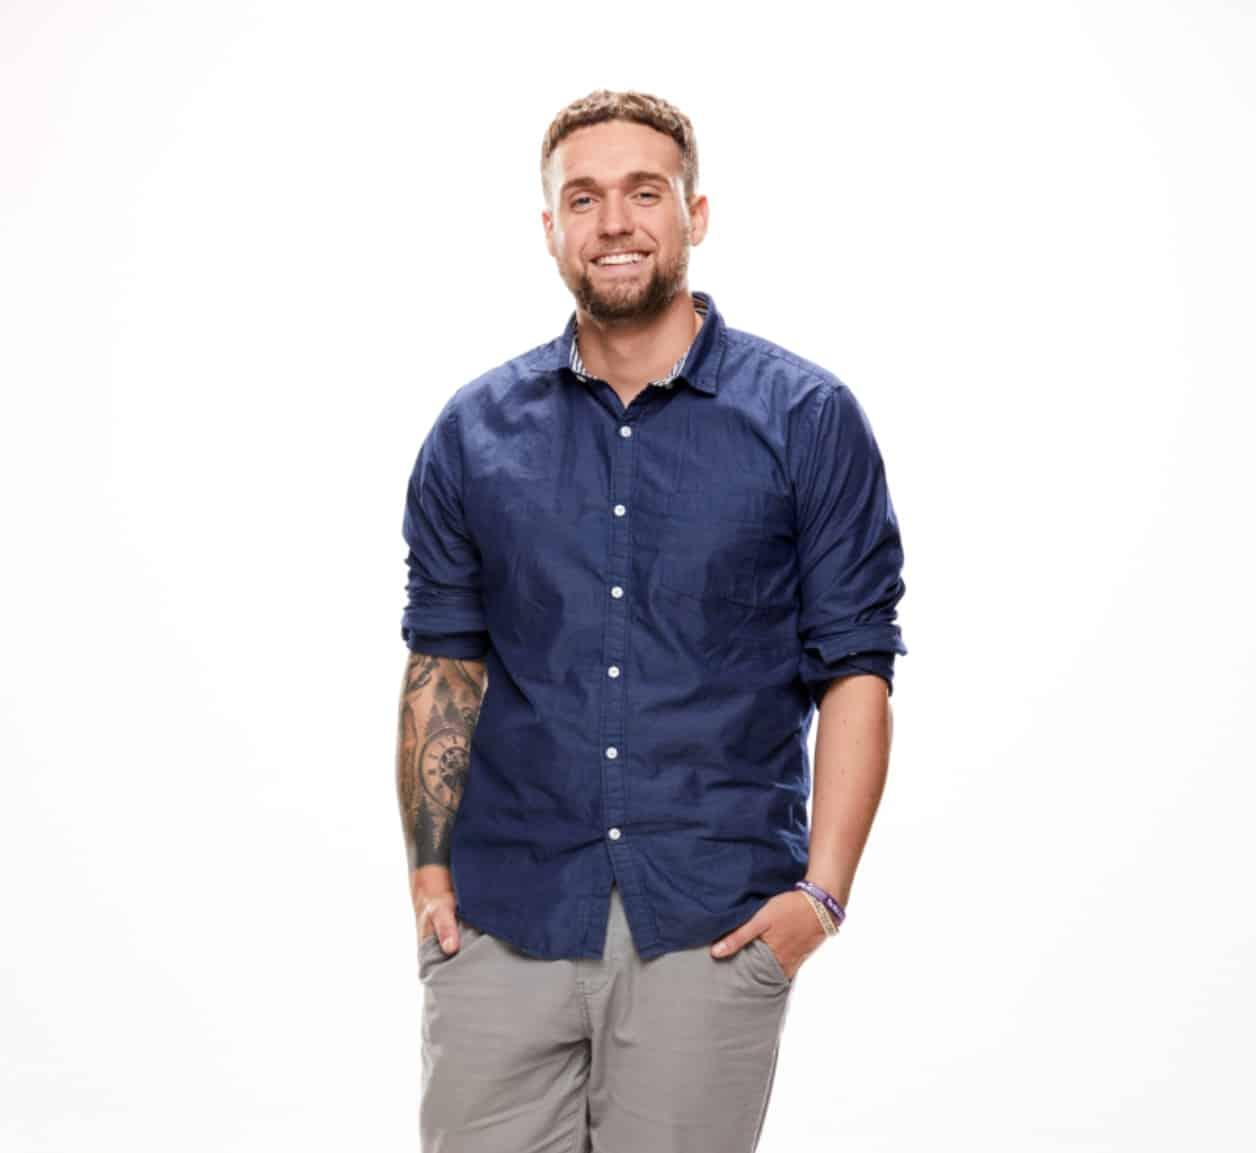 Nick Maccarone - Big Brother 2019 Cast Photos